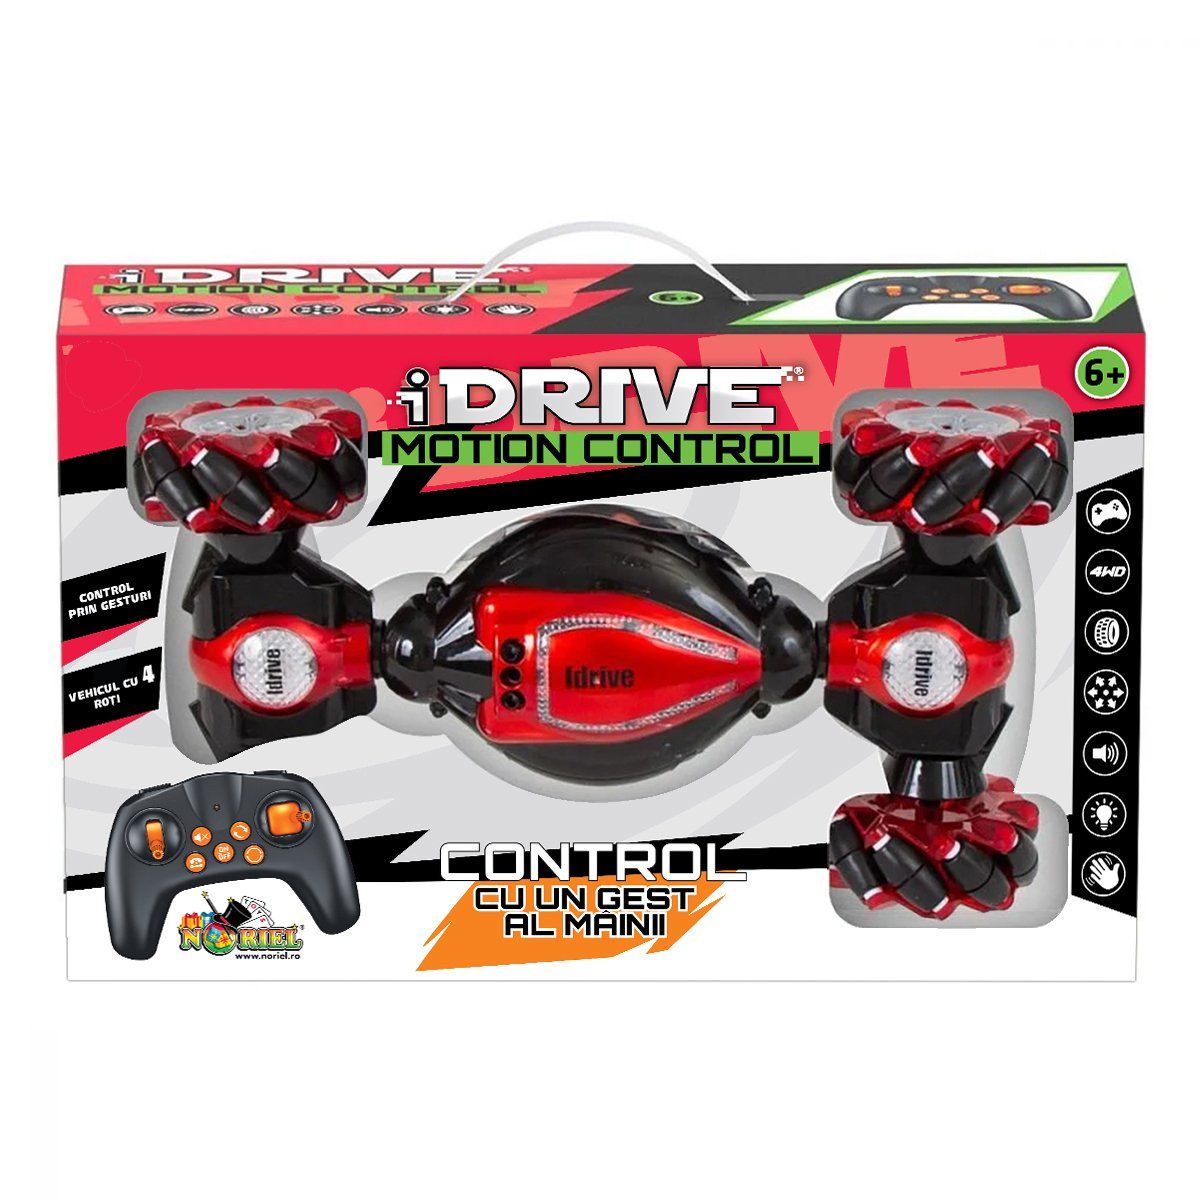 Masinuta cu telecomanda si control prin gesturi, iDrive Motion Control, Drift 4x4